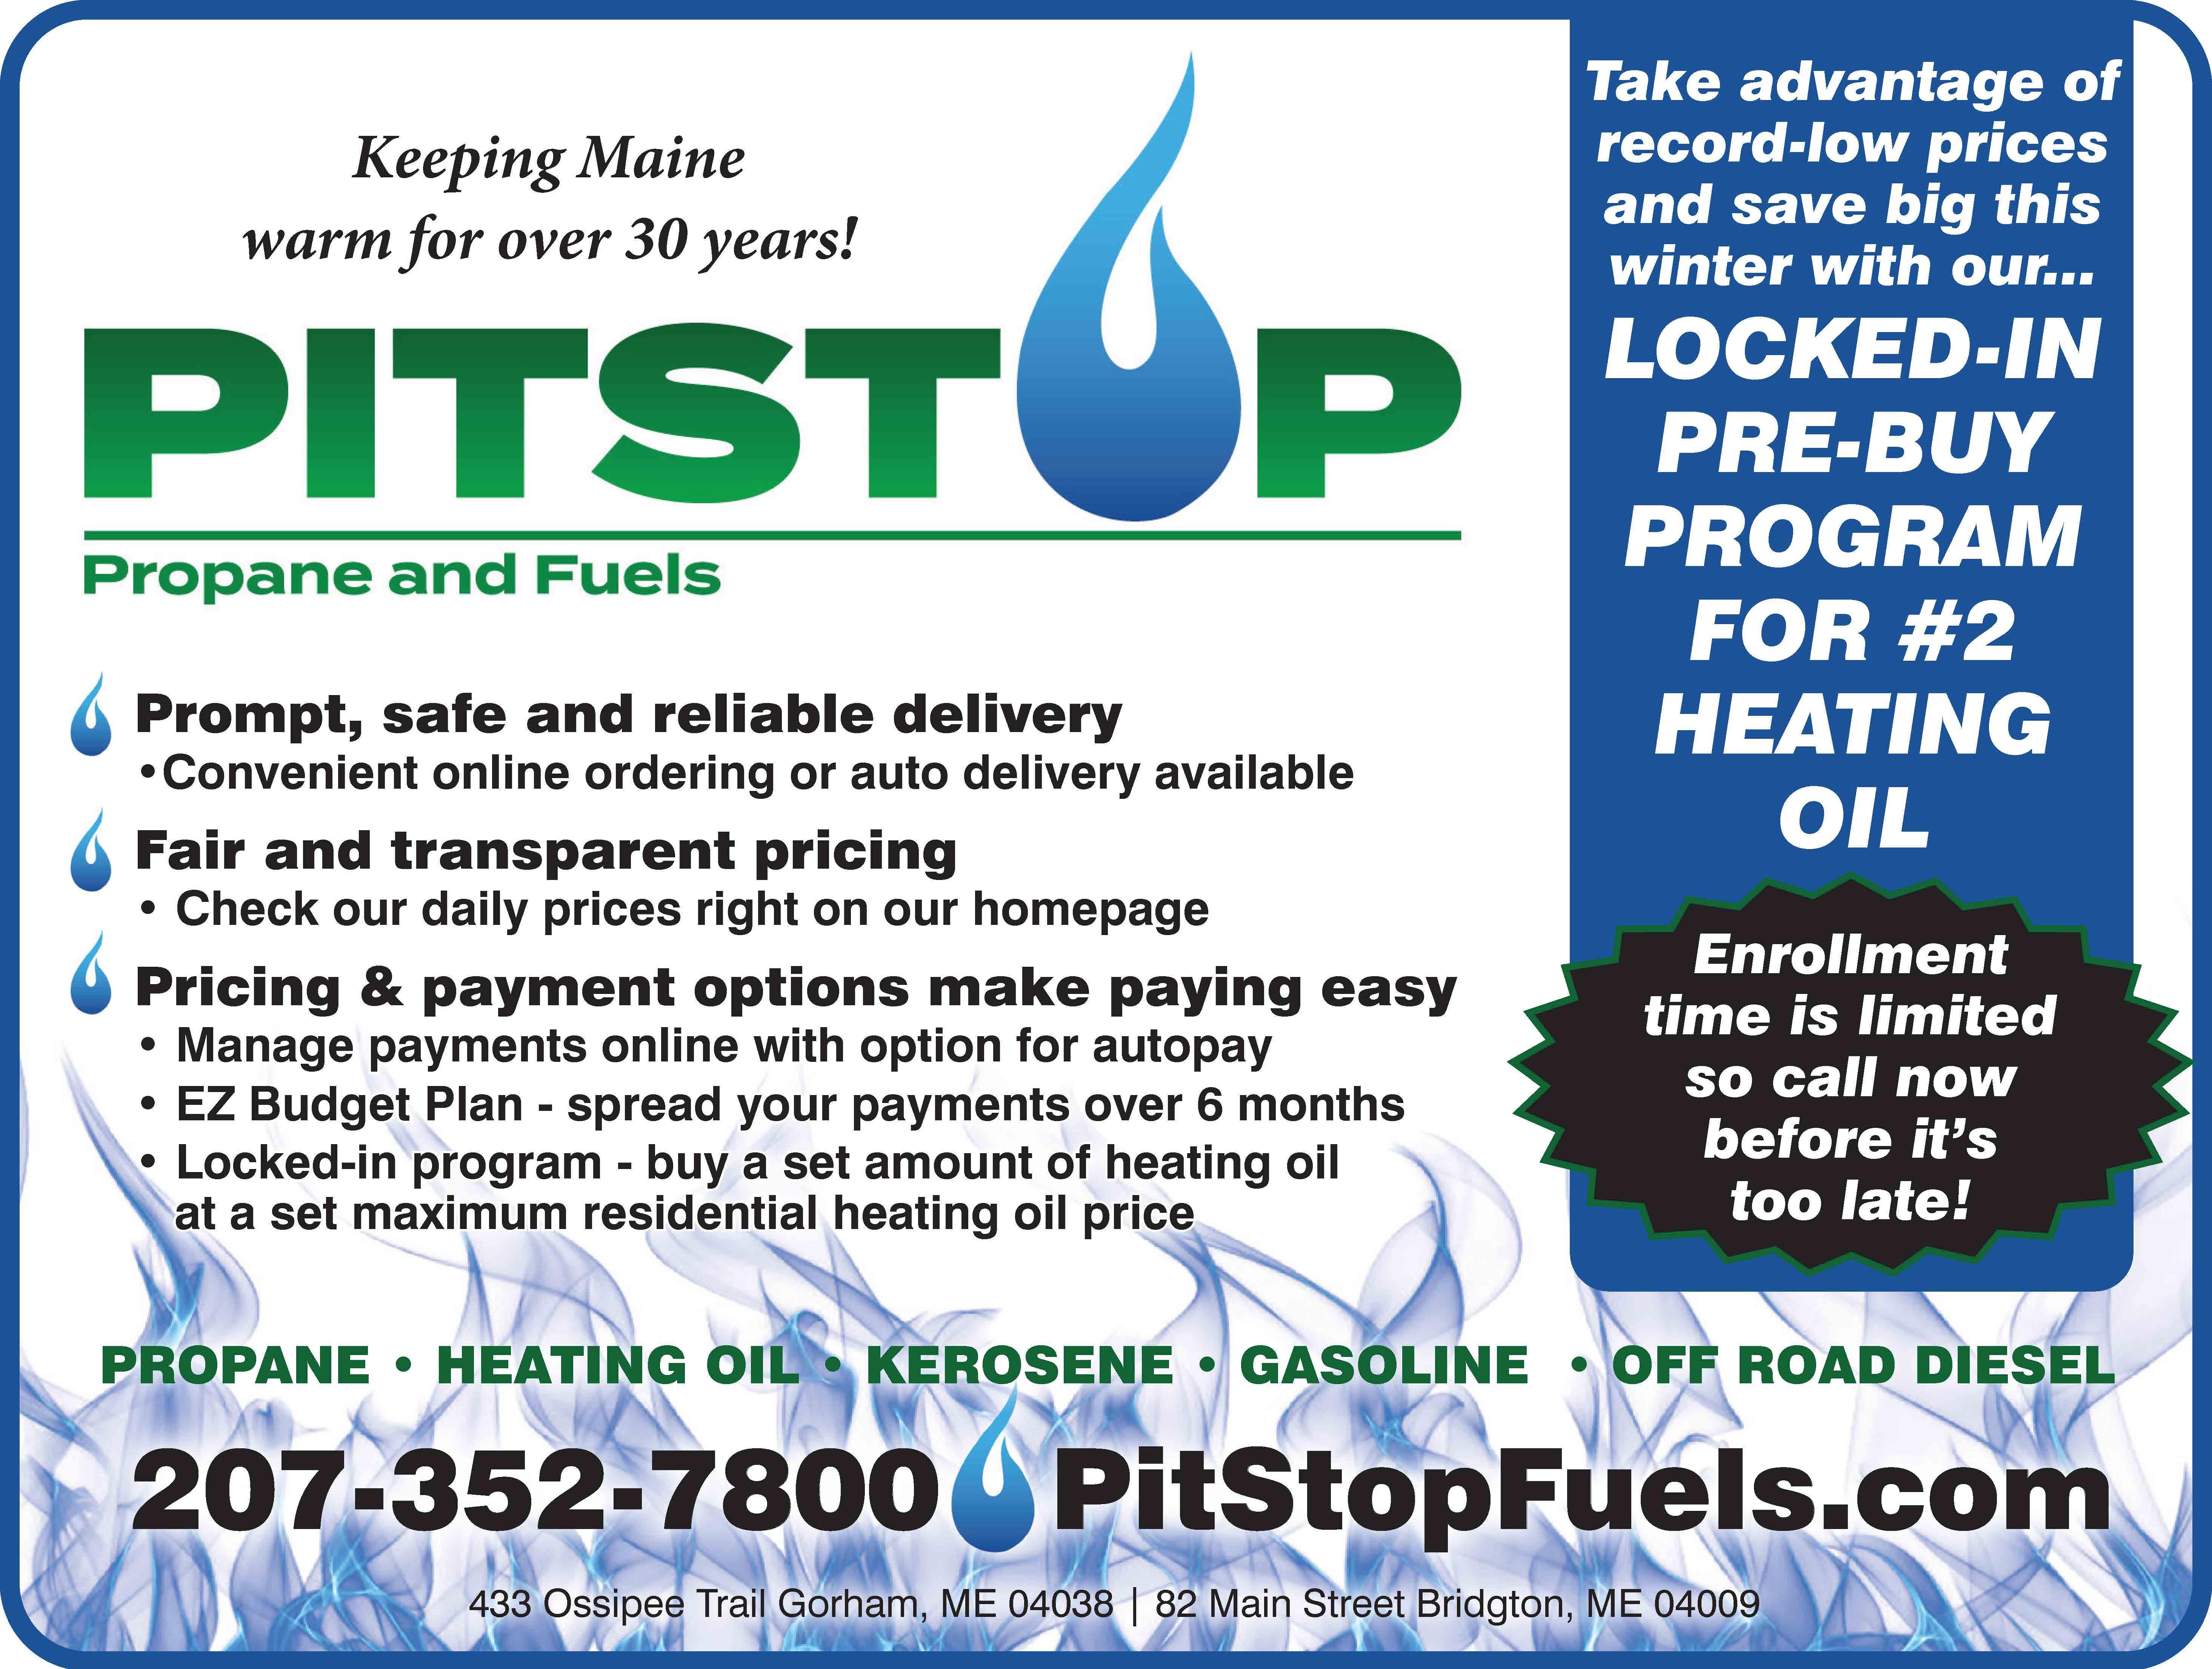 https://www.pitstopfuels.com/